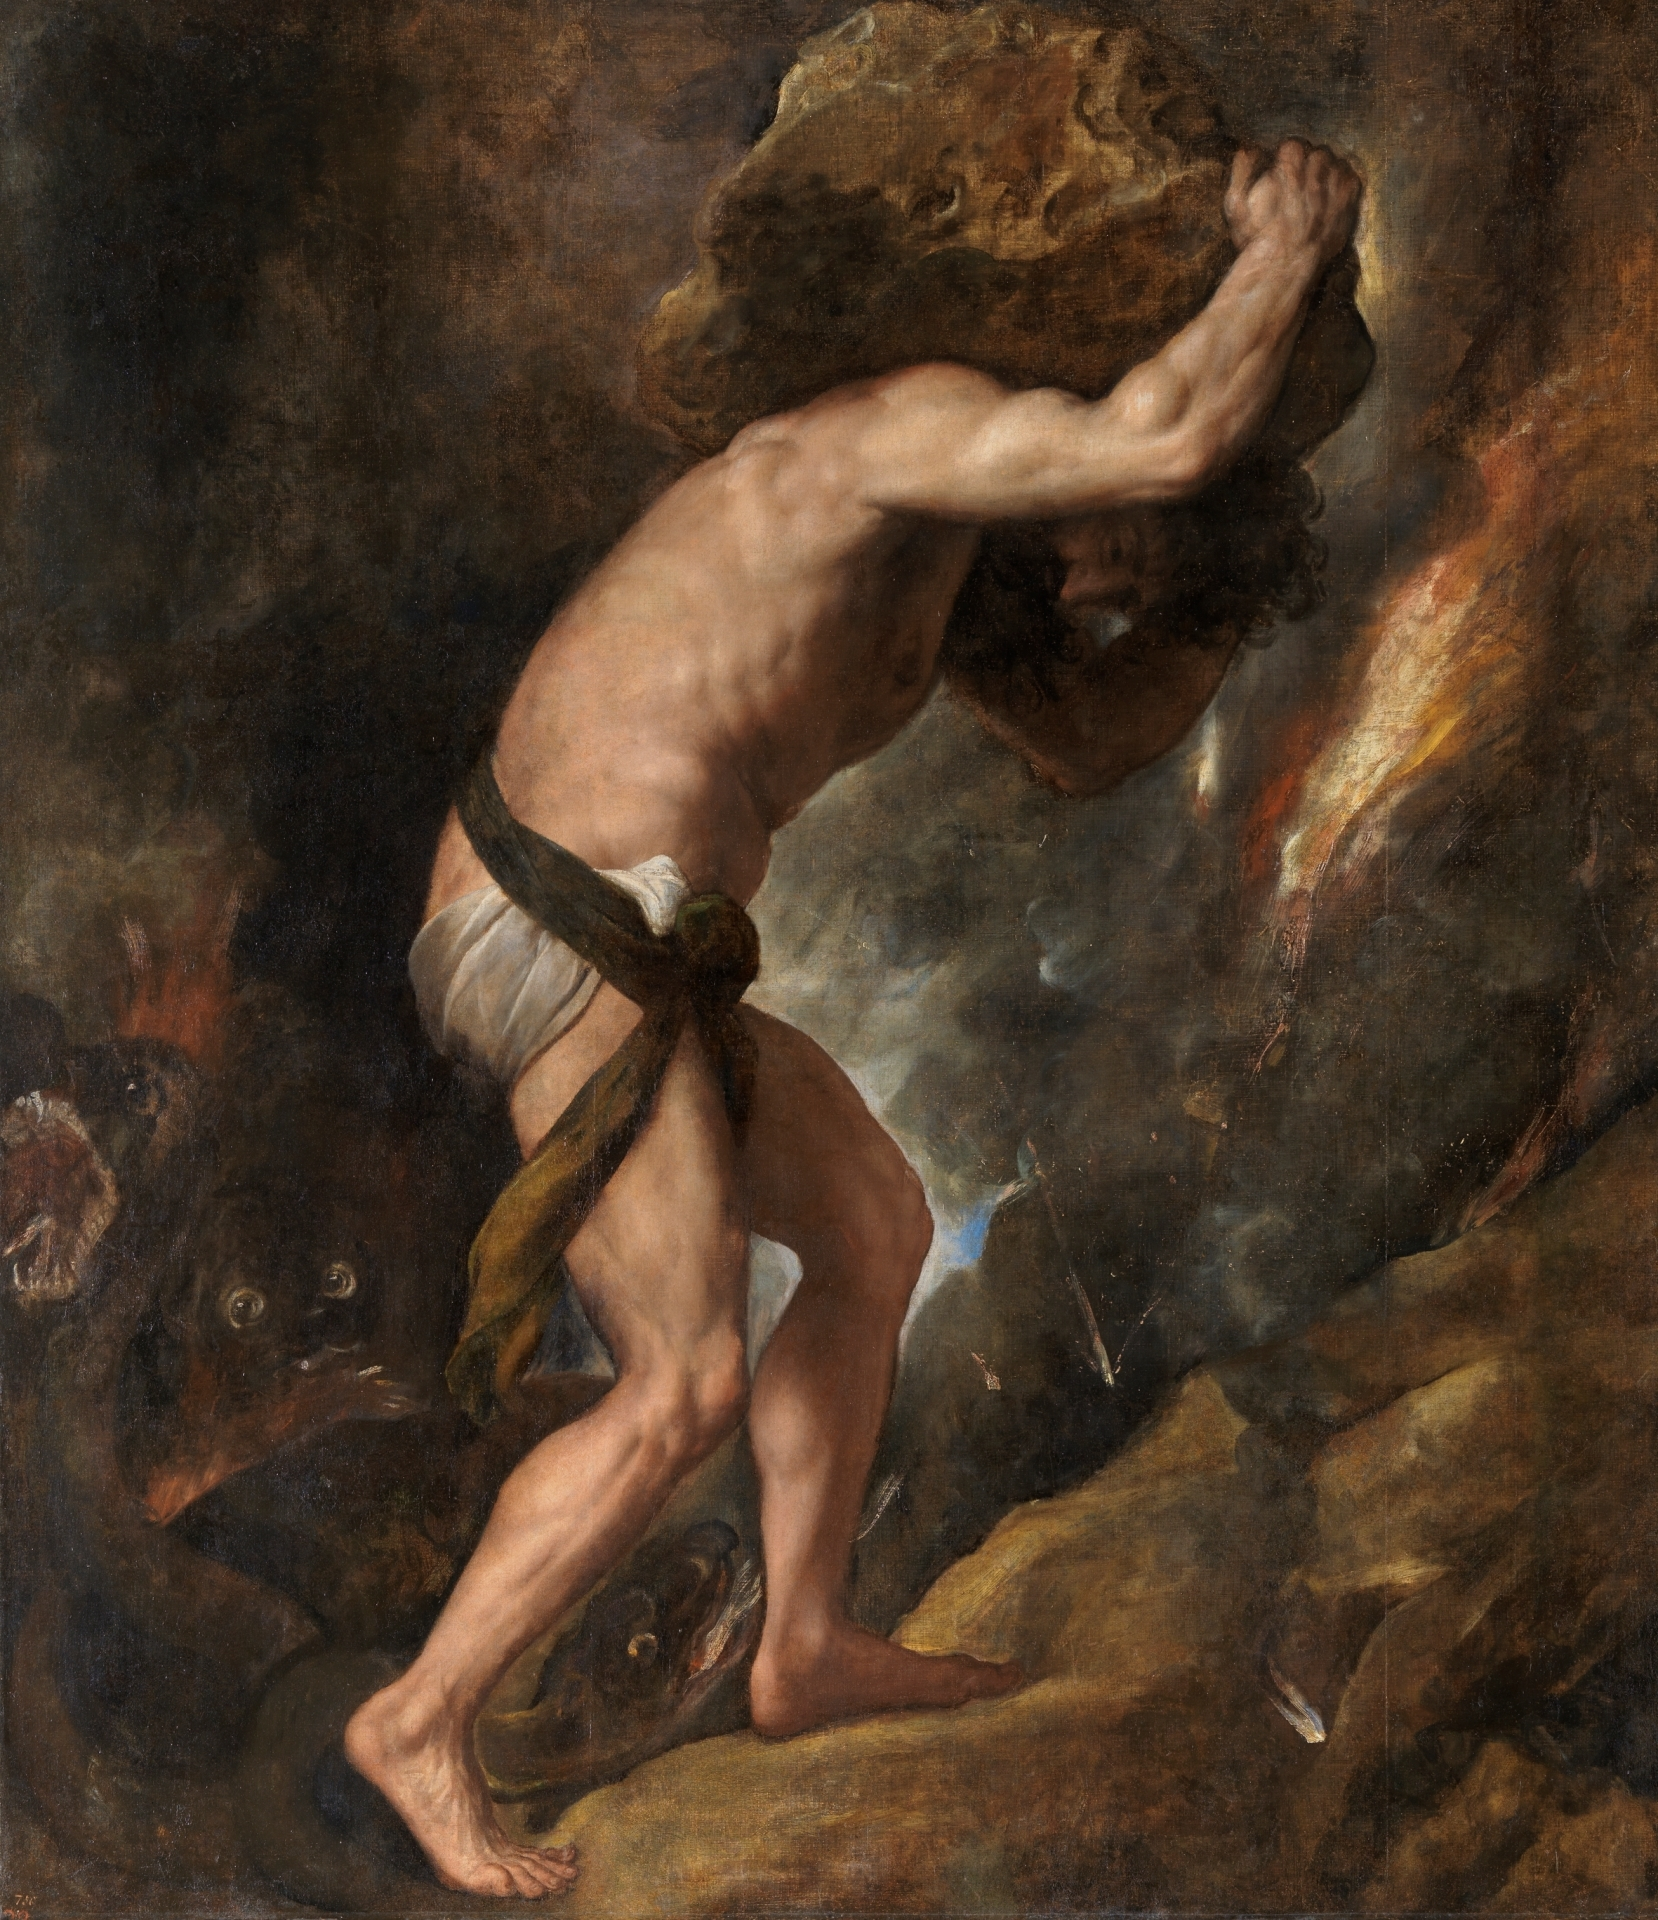 Sisif, Muzeul Del Prado